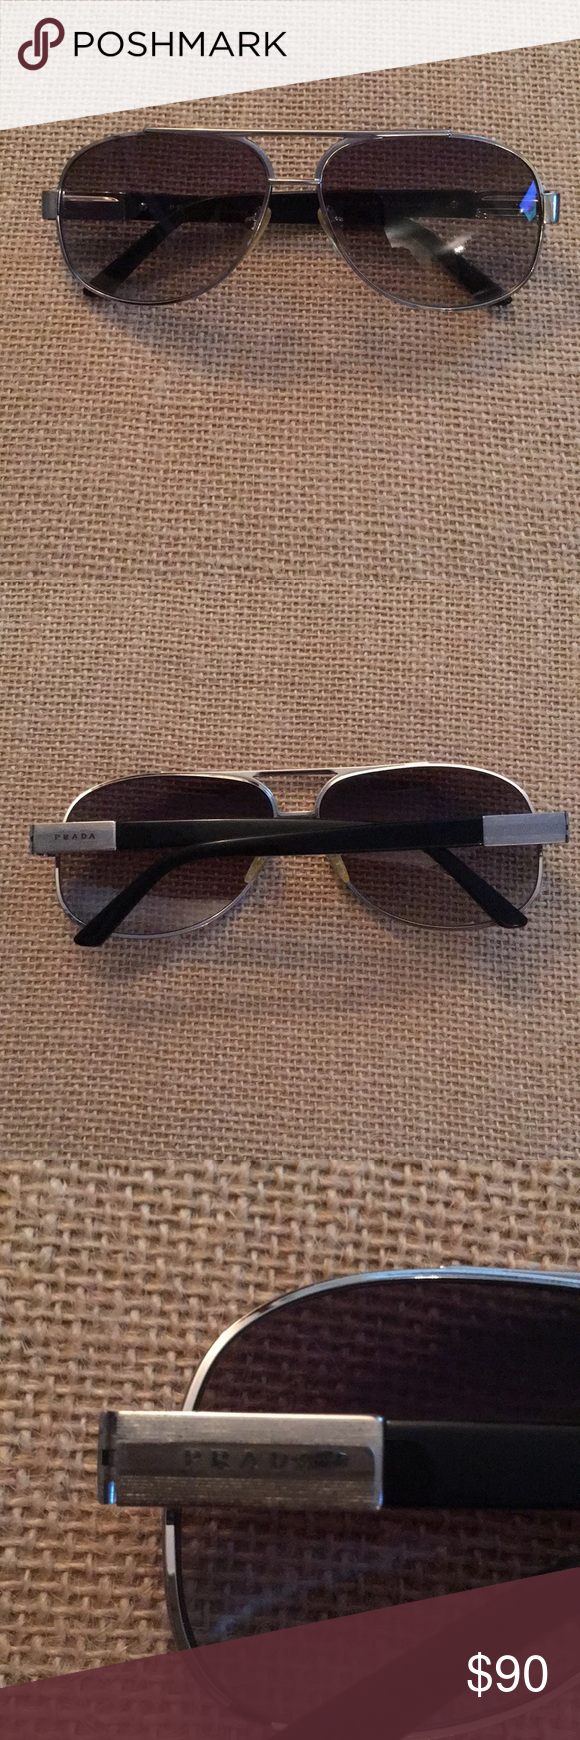 9f4b7714f144 Men s Prada Sunglasses Men s Prada silver   black aviators. Prada  Accessories Glasses